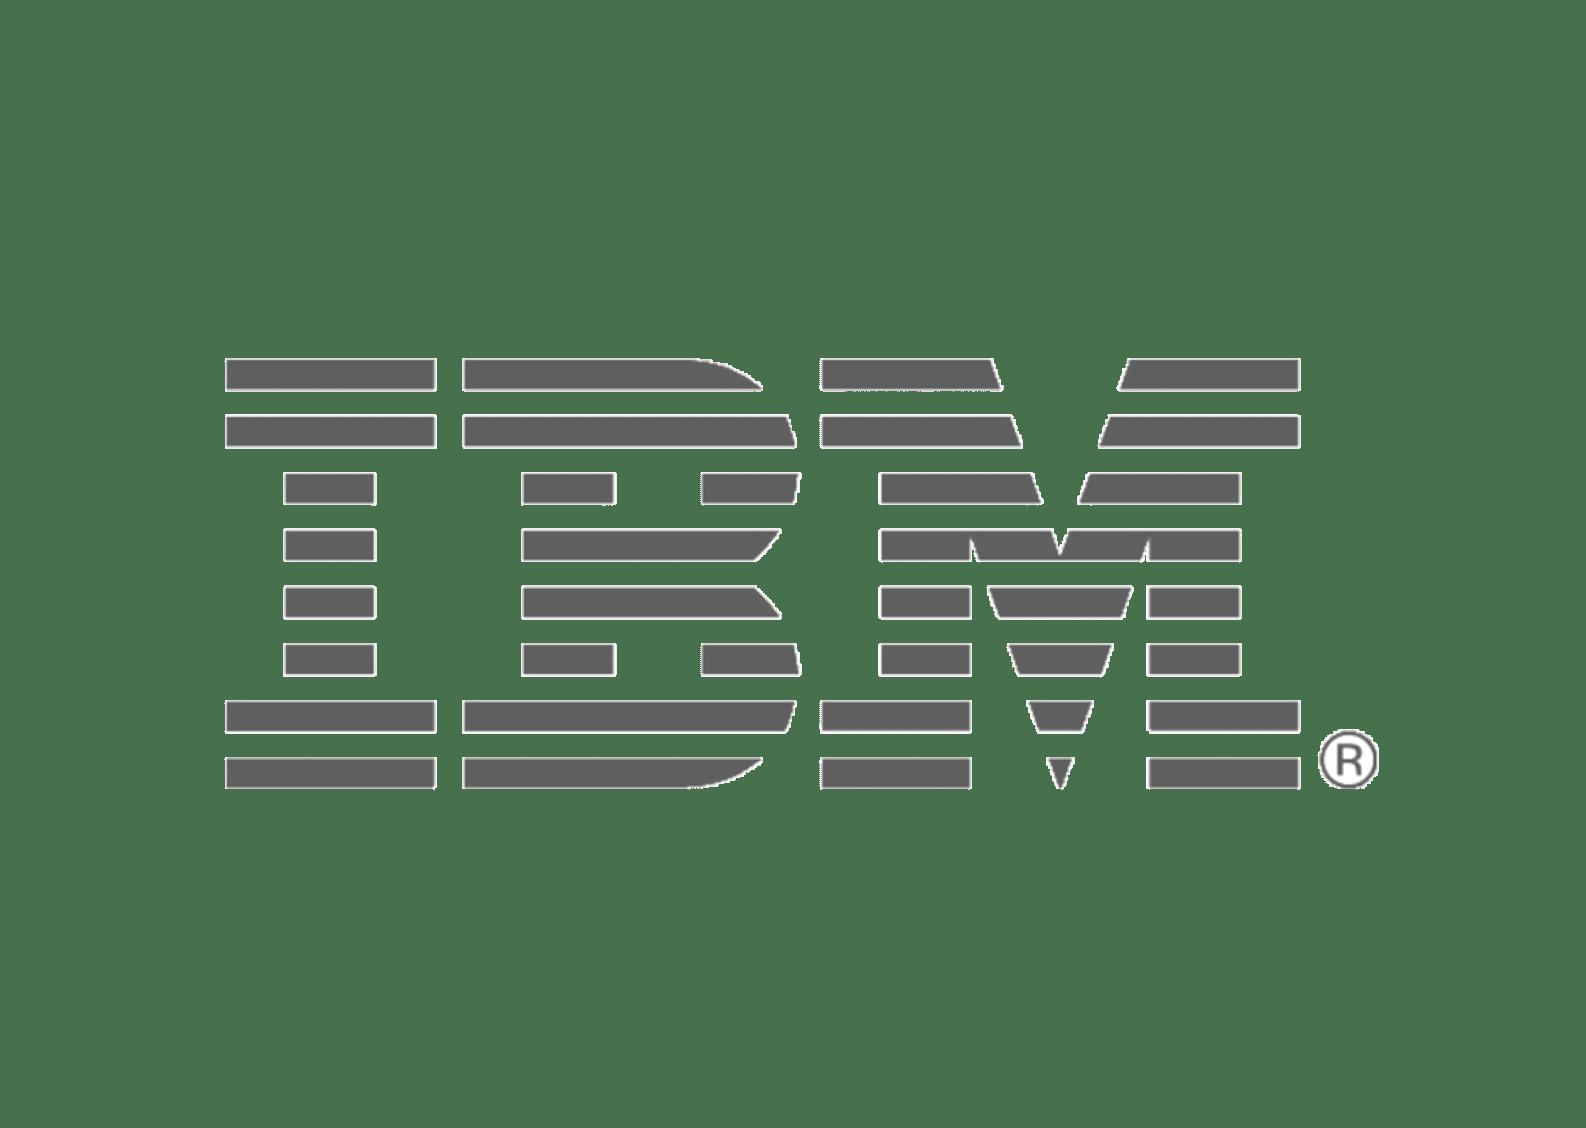 IBM_png-min.png